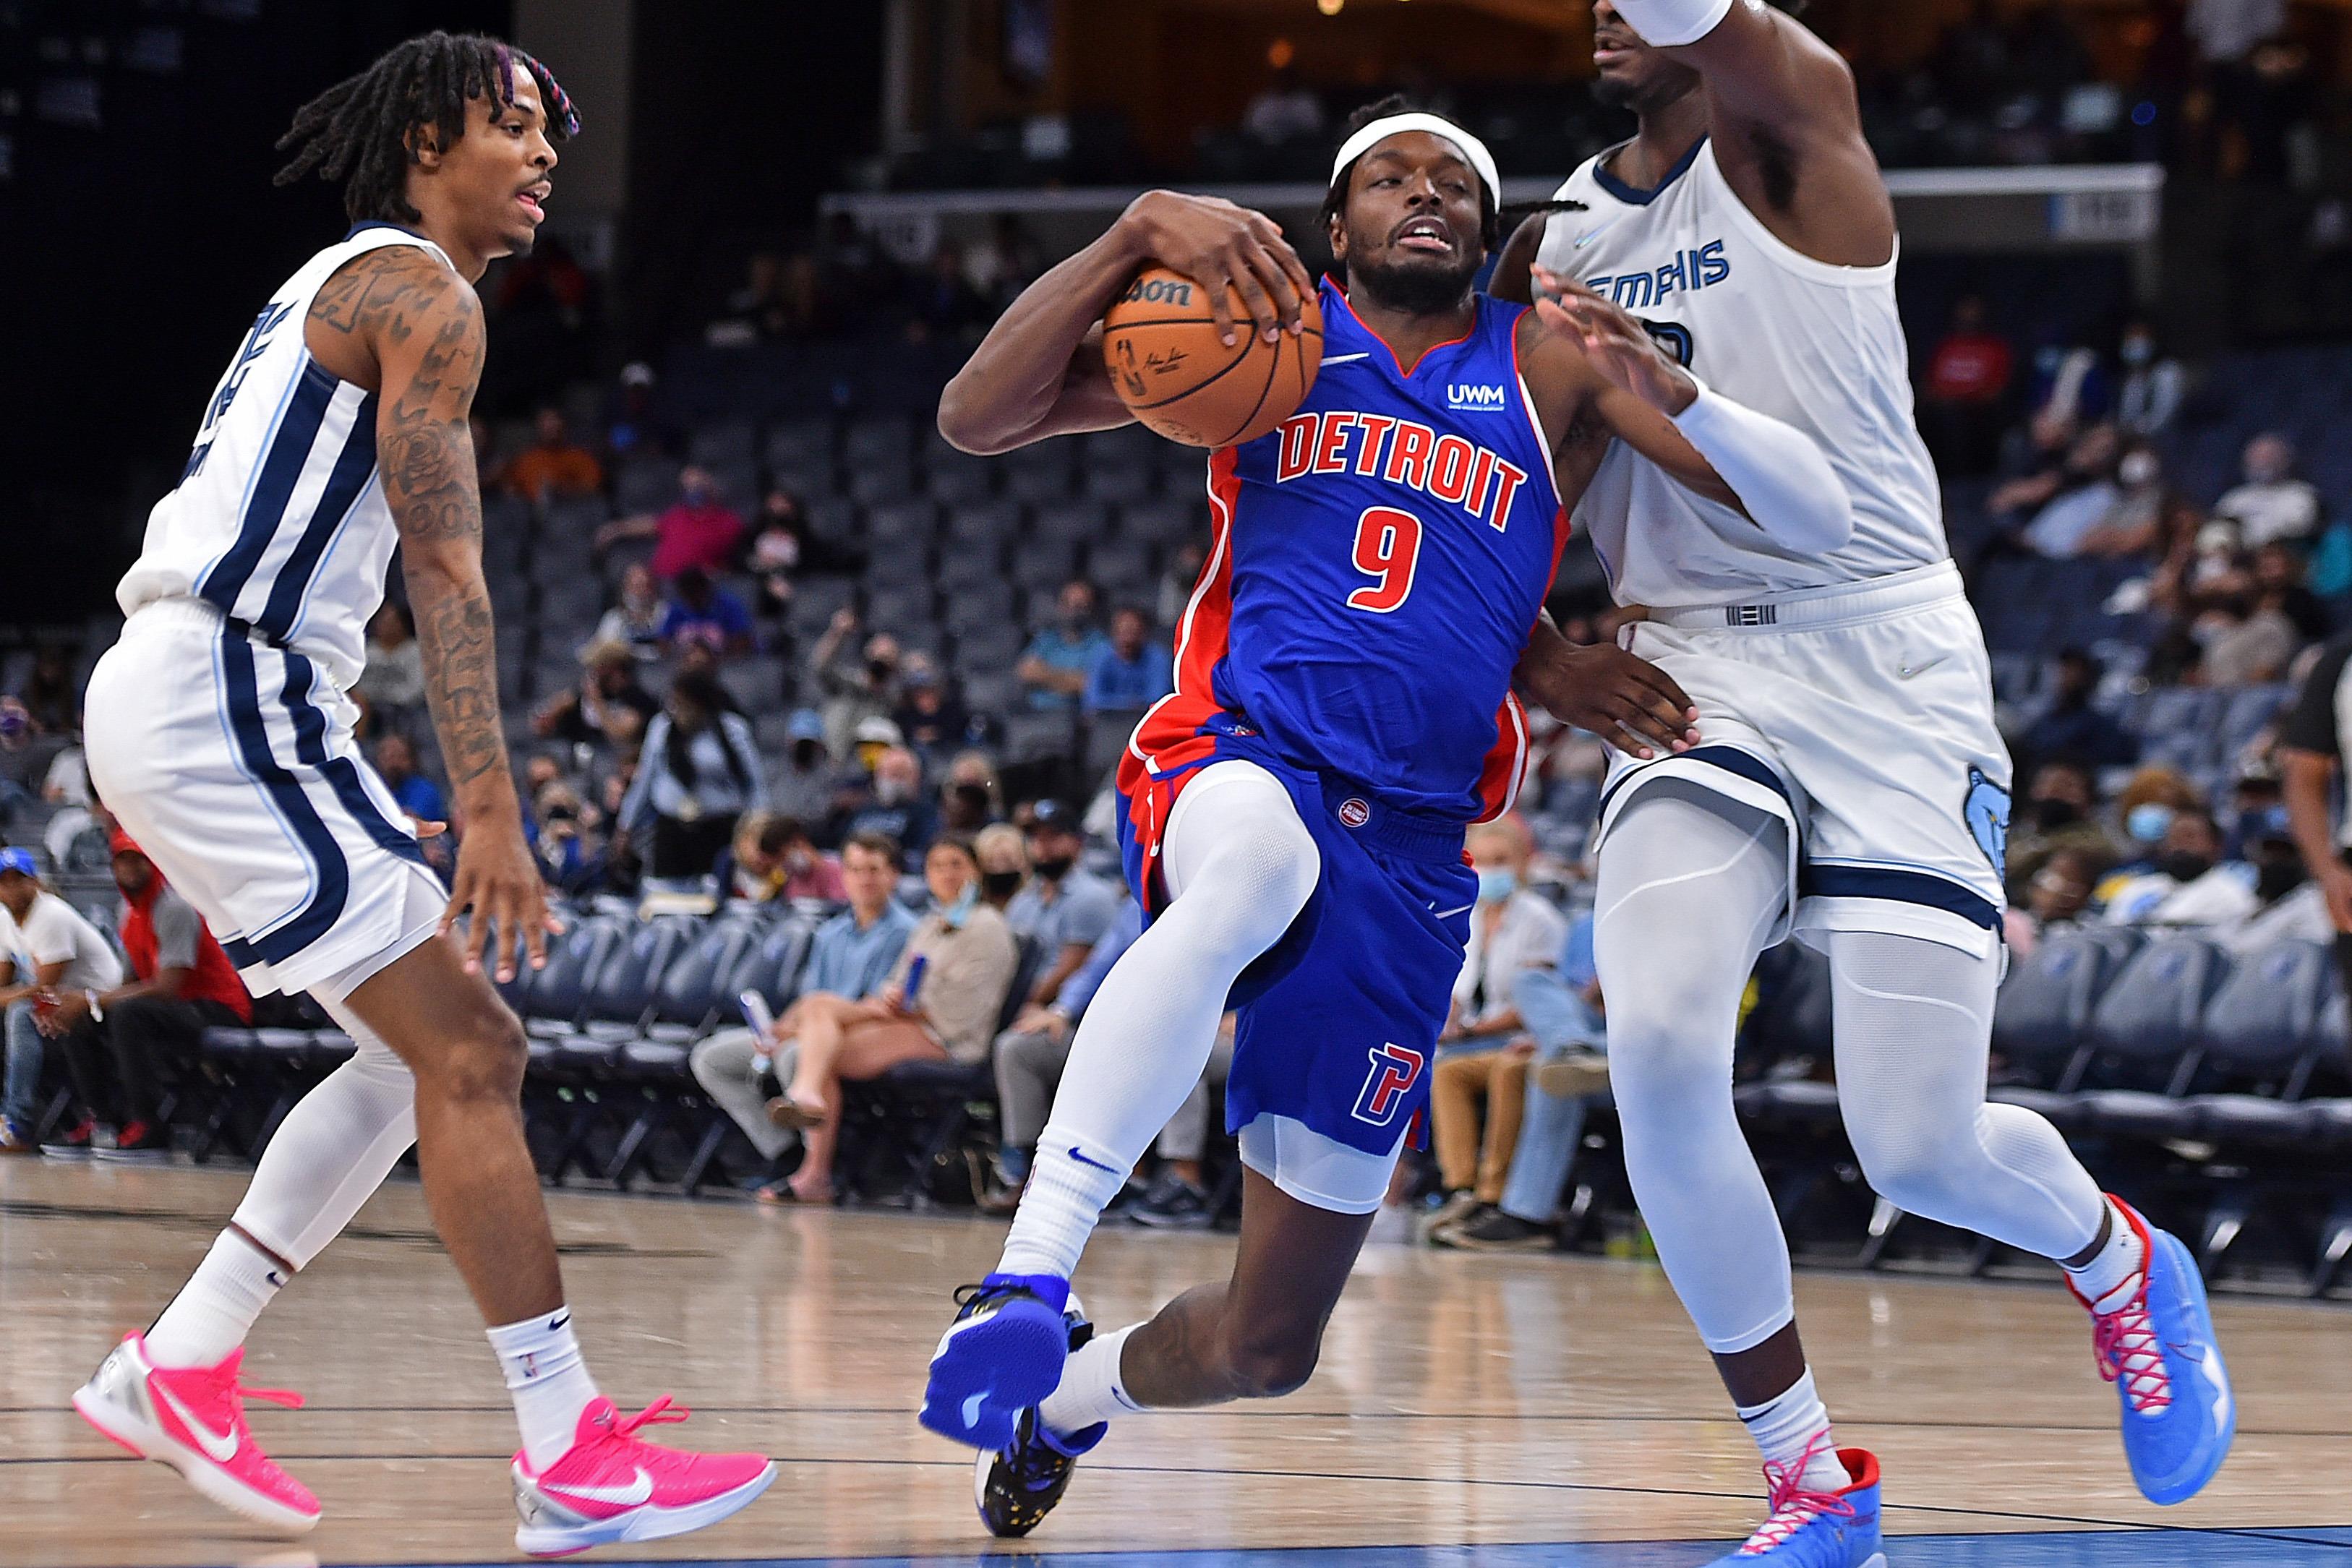 NBA: Preseason-Detroit Pistons at Memphis Grizzlies